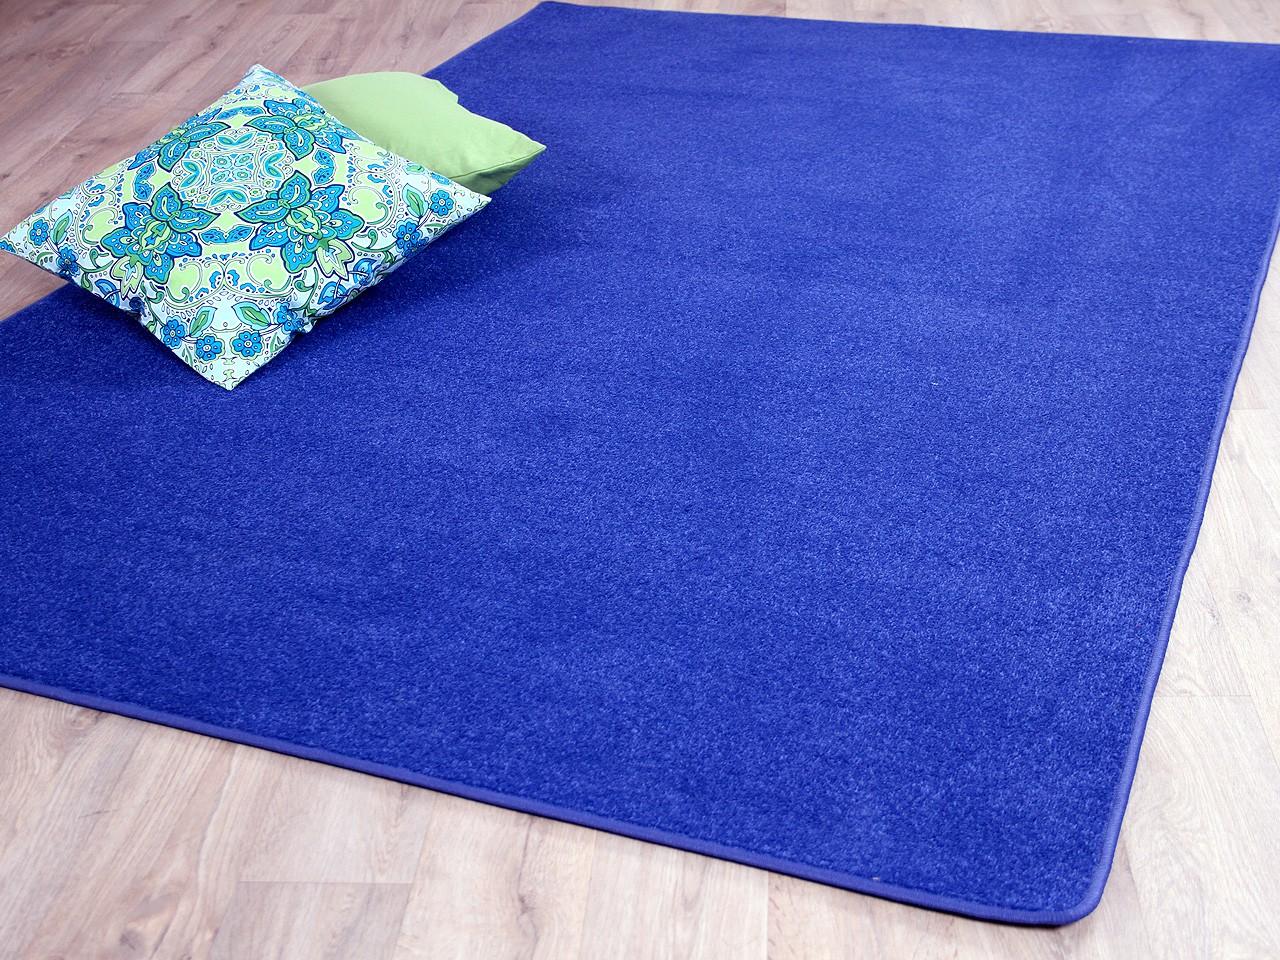 trend velours teppich joy blau sonderaktion teppiche veloursteppiche trend velours joy. Black Bedroom Furniture Sets. Home Design Ideas